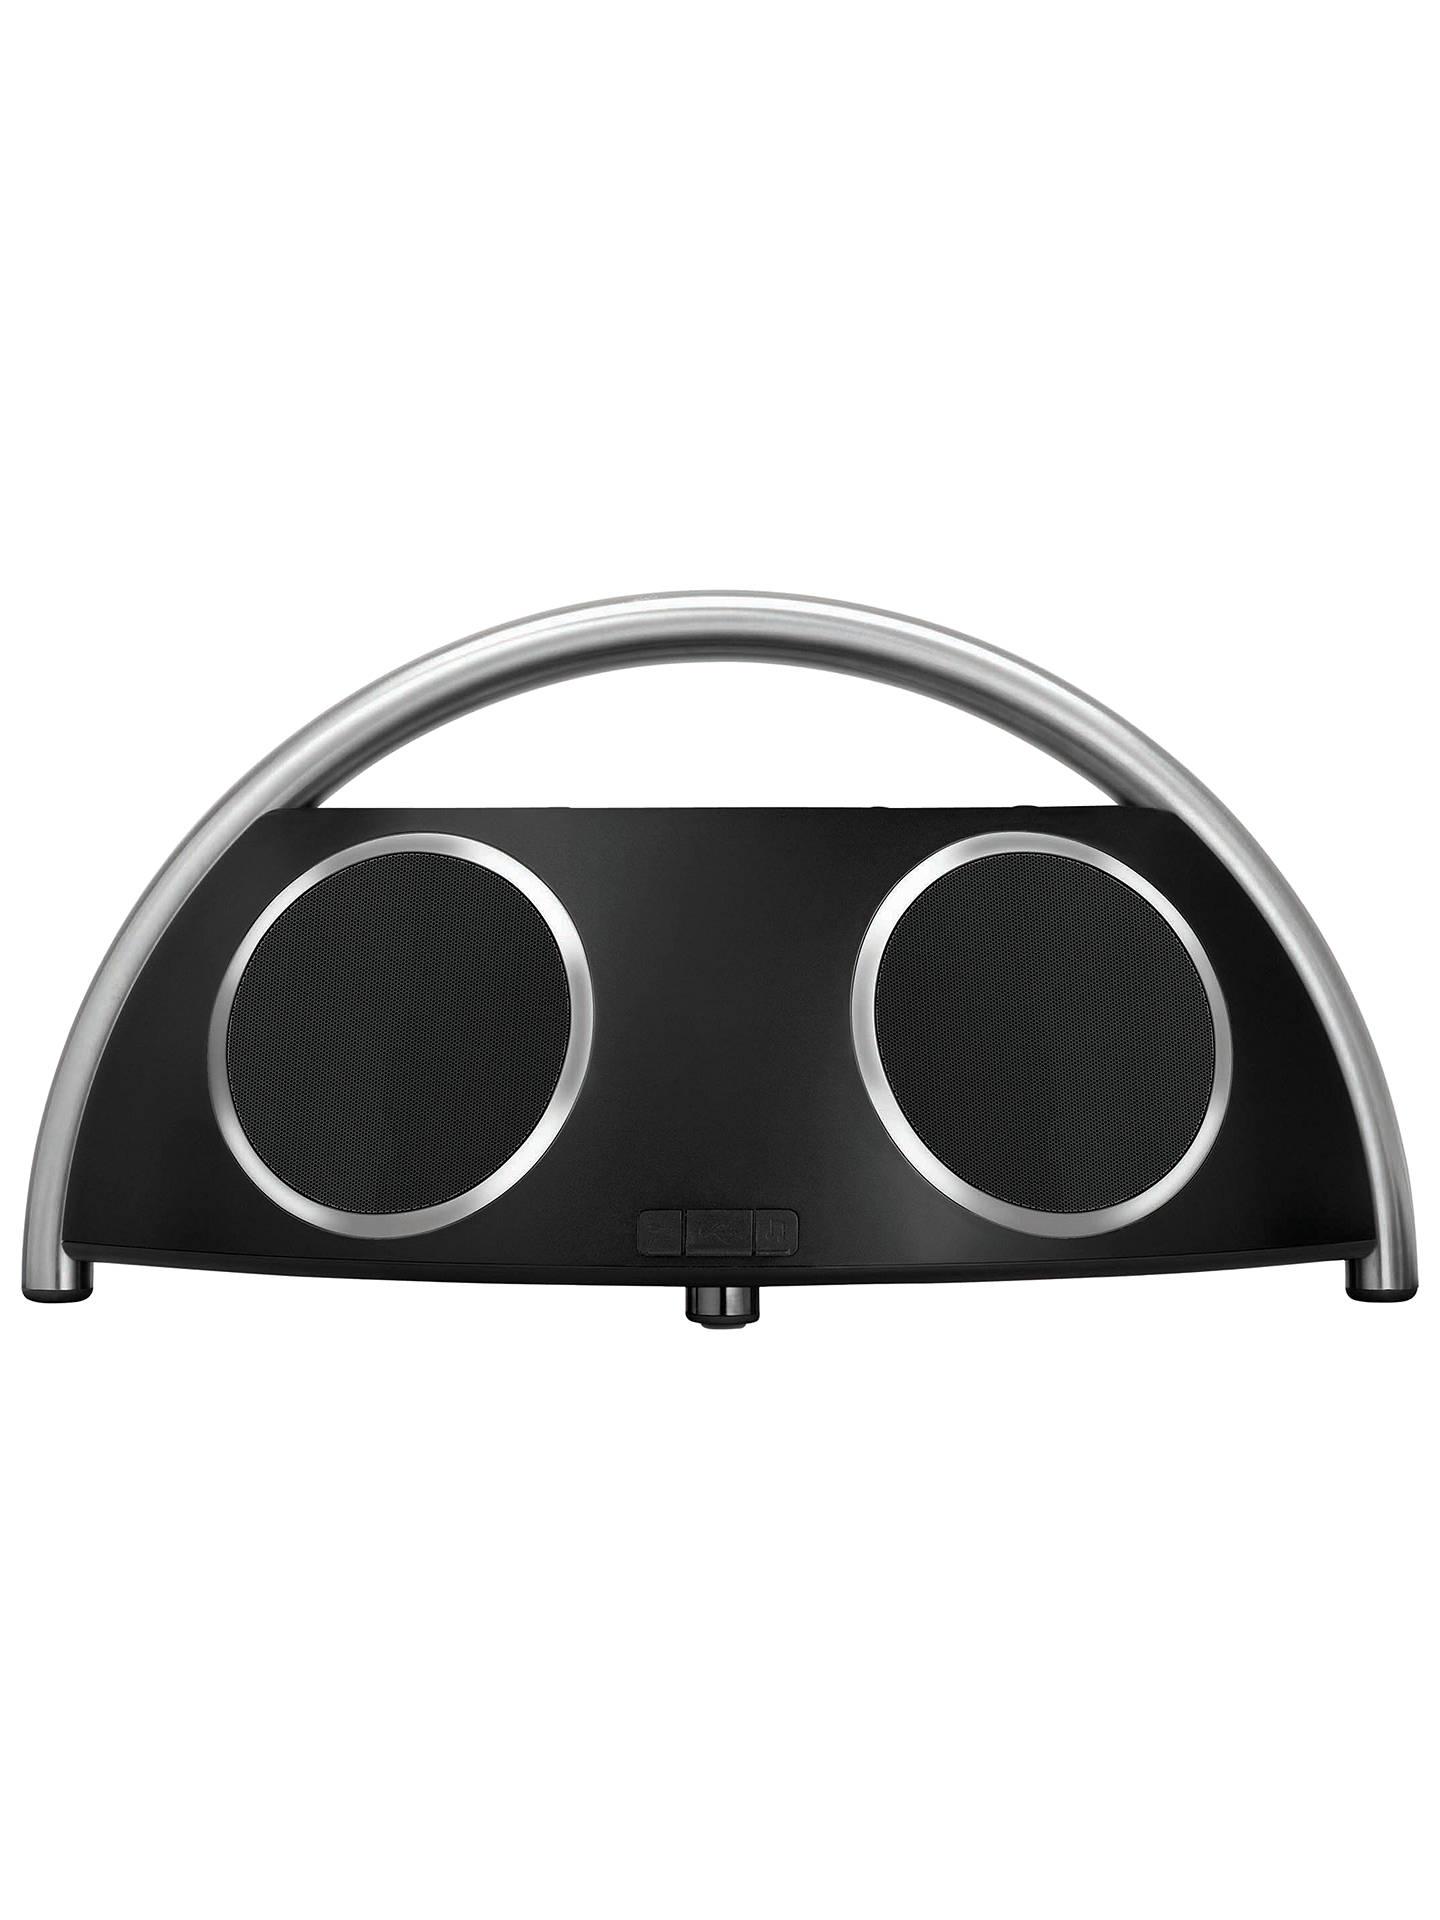 10cc1f4d7ef Harman Kardon Go + Play Wireless Bluetooth Speaker Dock at John ...